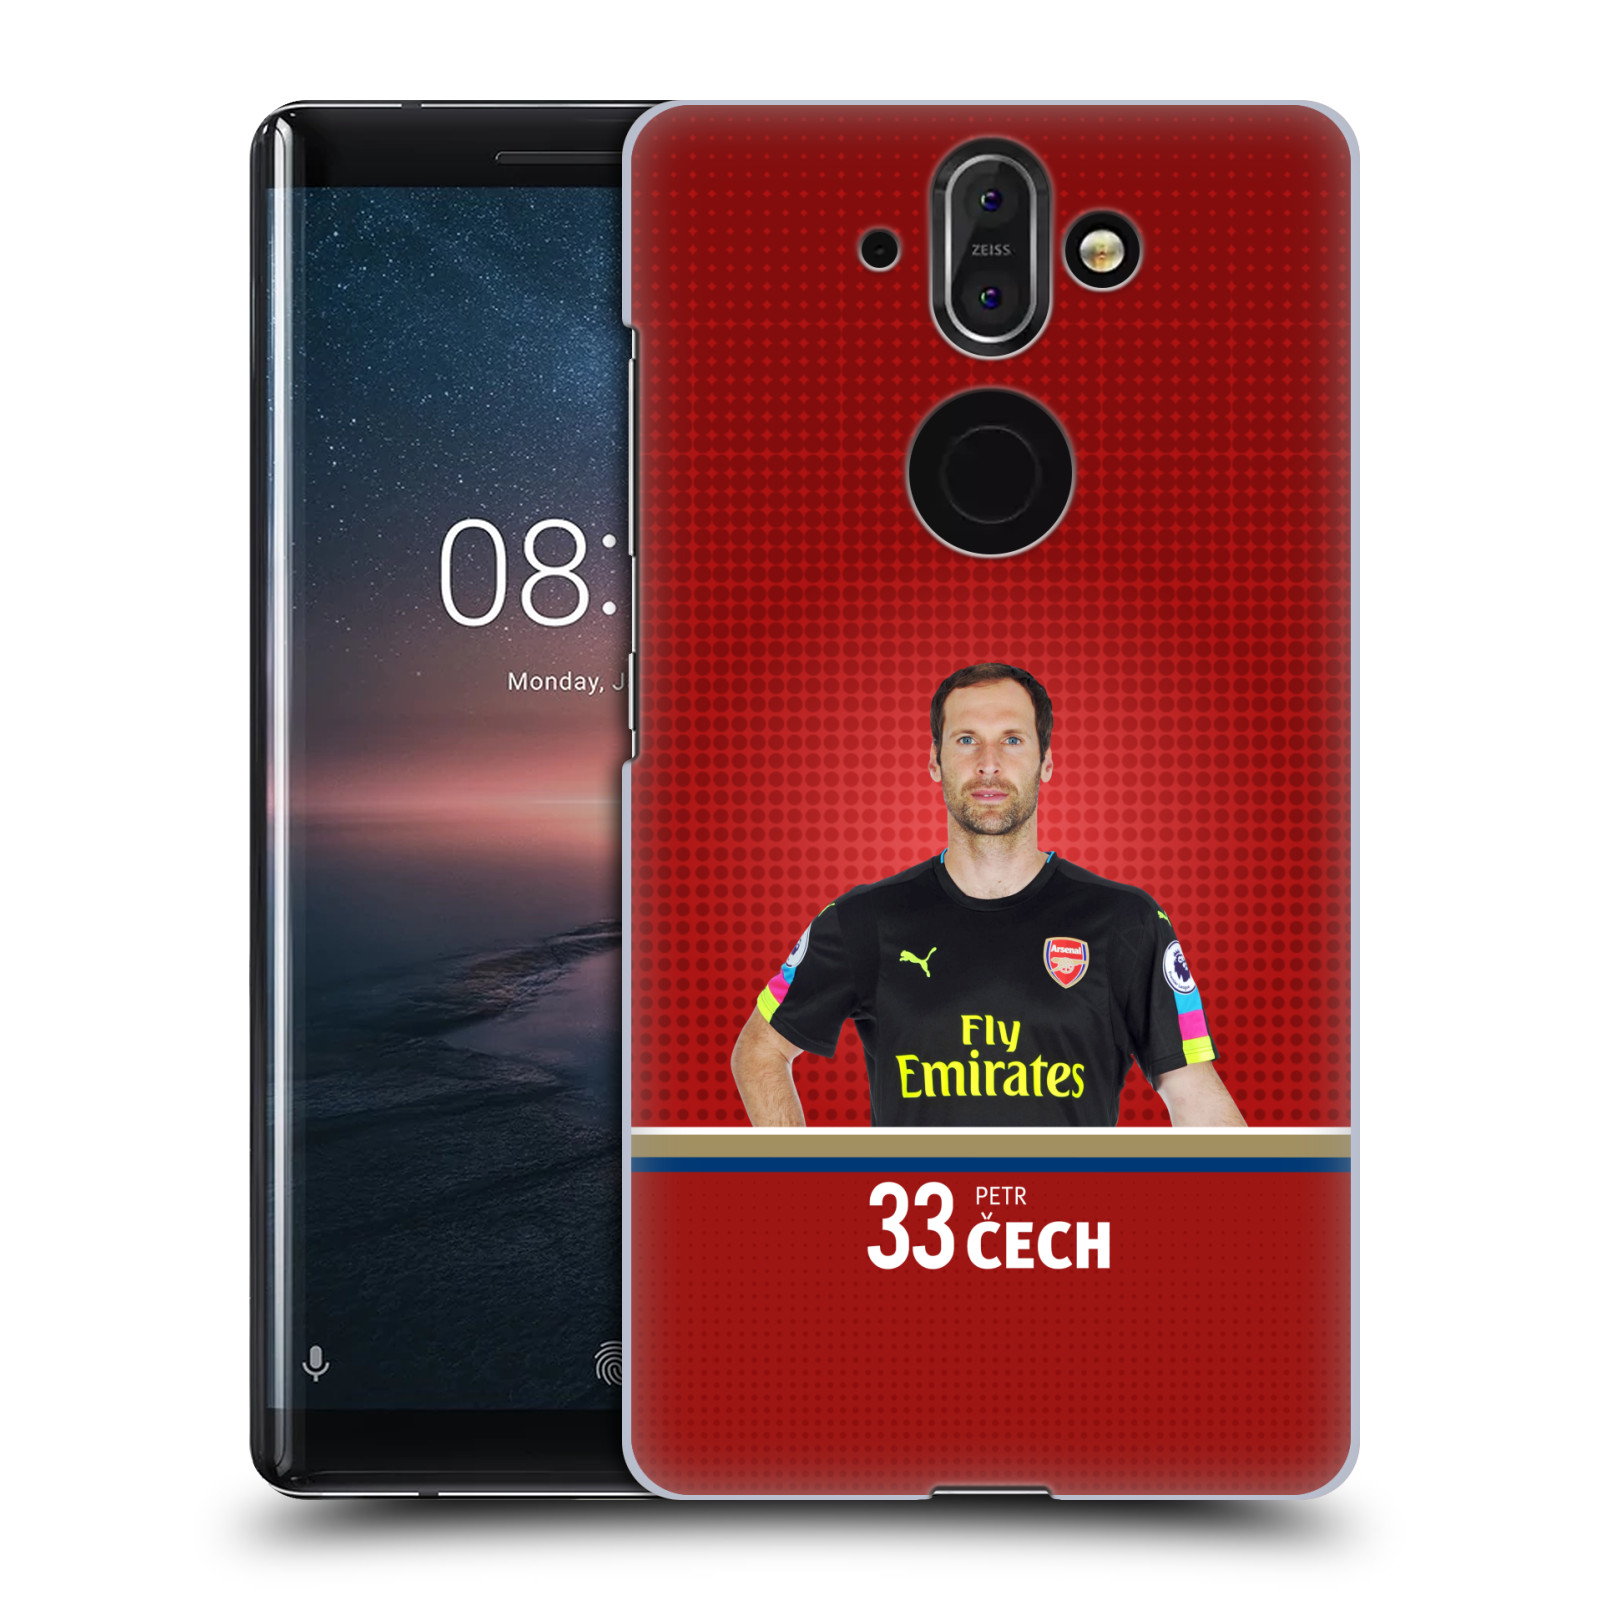 Plastové pouzdro na mobil Nokia 8 Sirocco - Head Case - Arsenal FC - Petr Čech